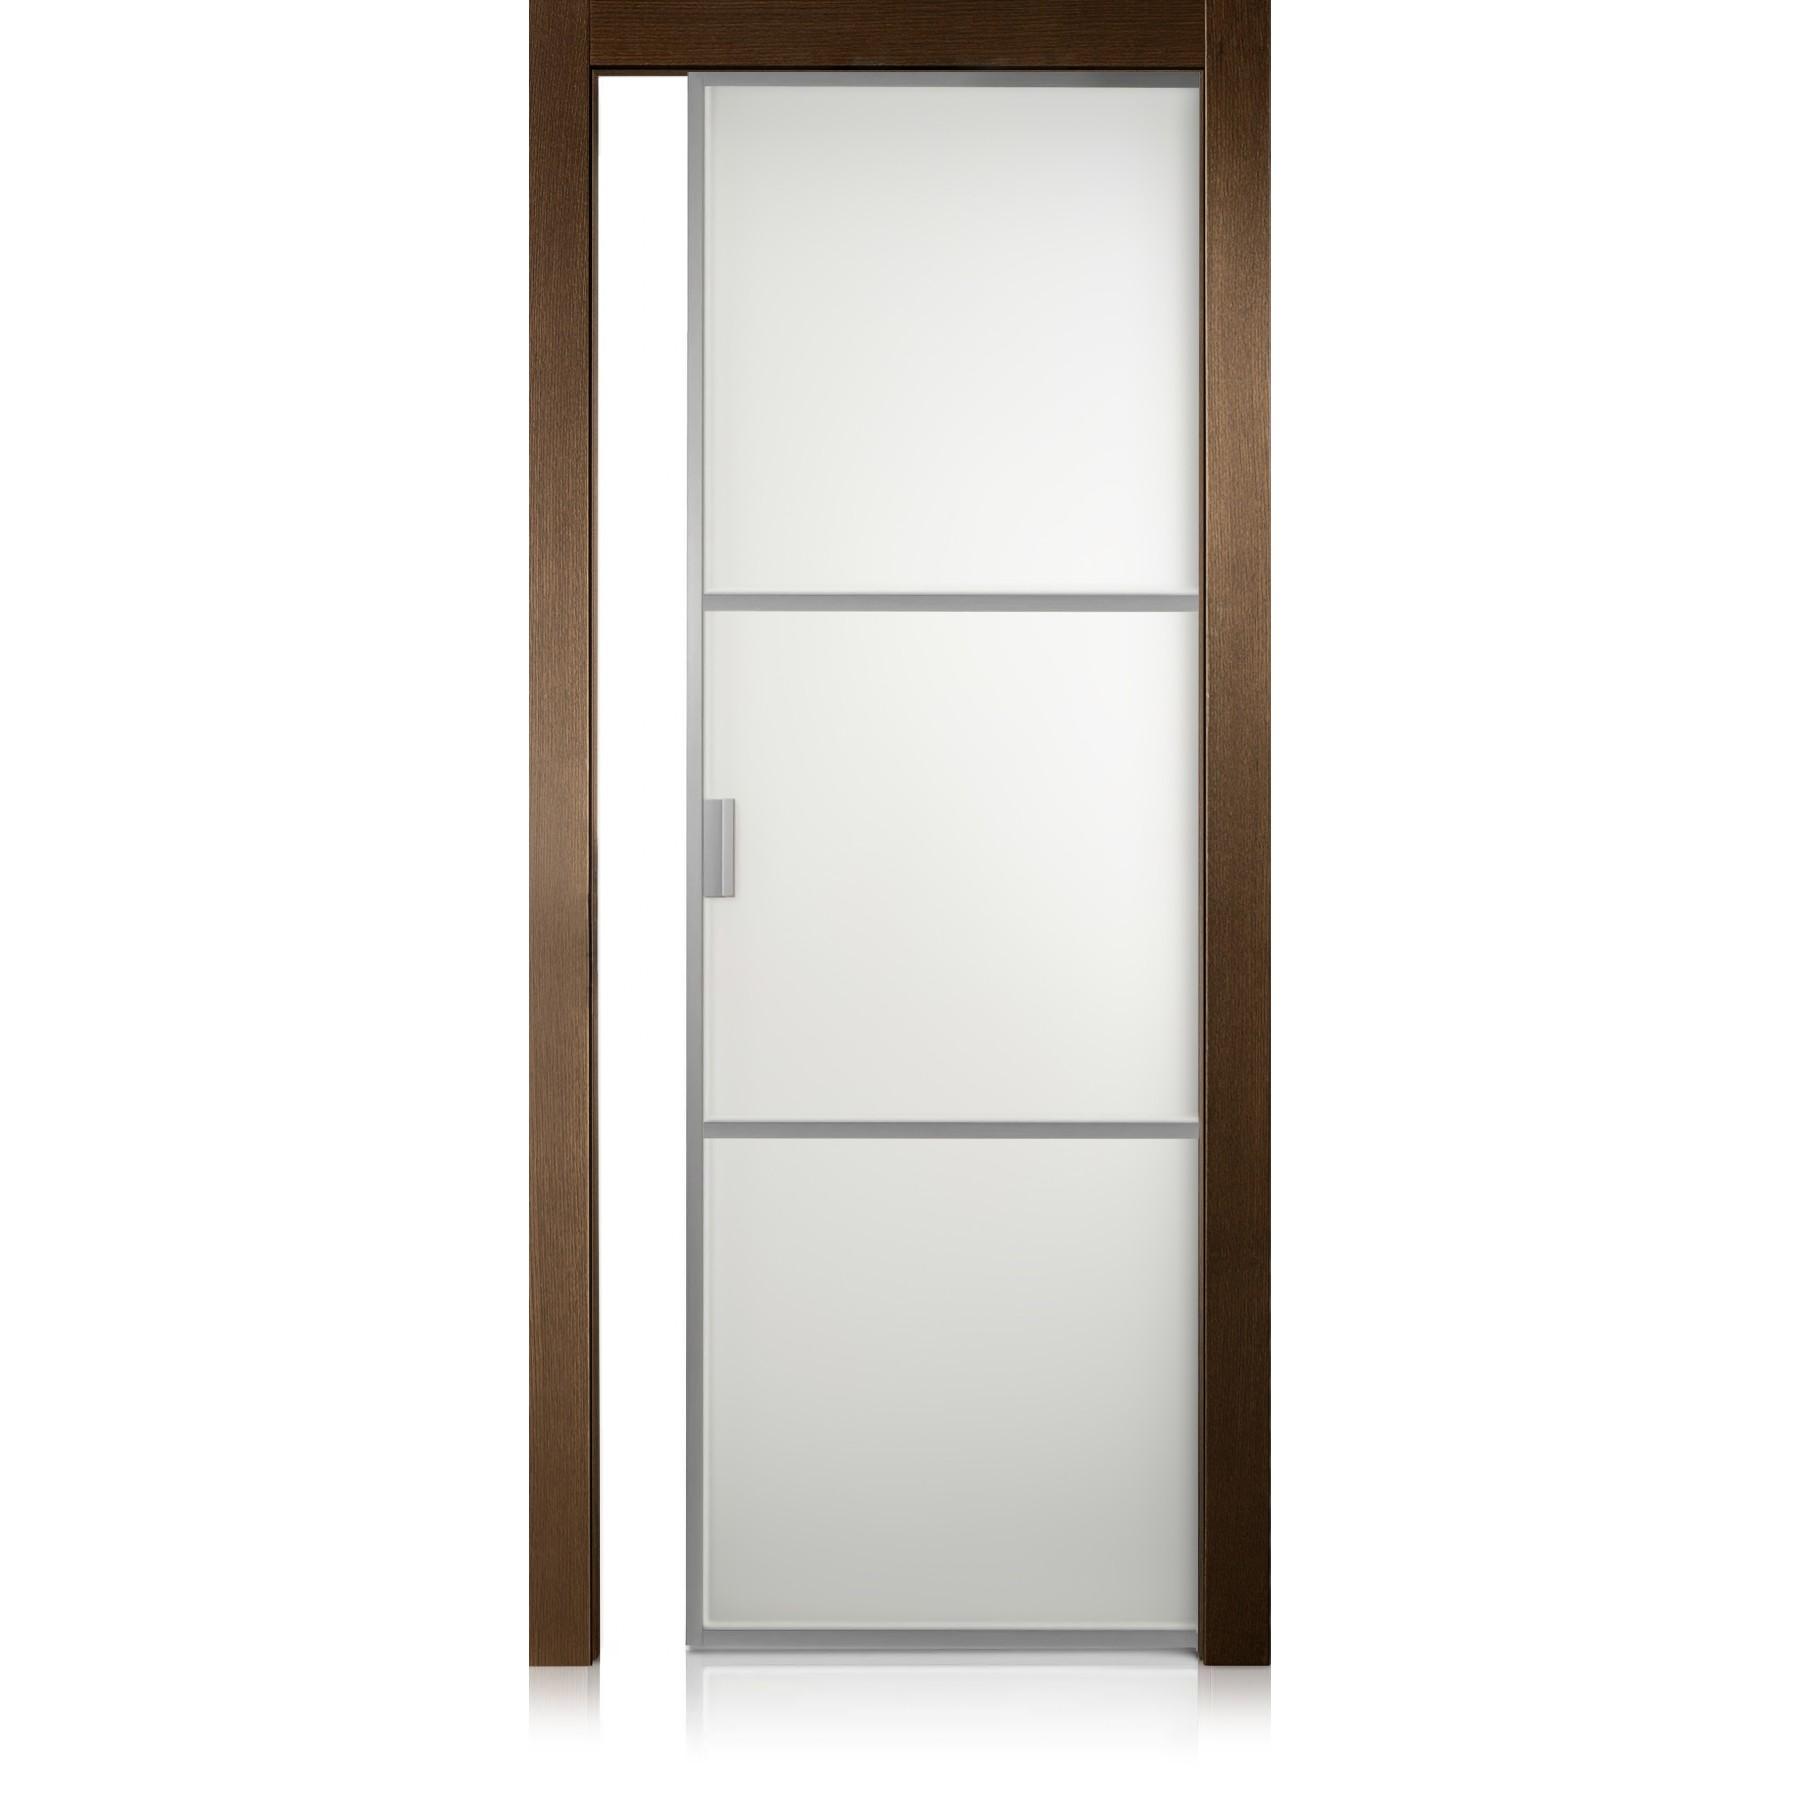 Porta Cristal Frame / 2 ecorovere nut